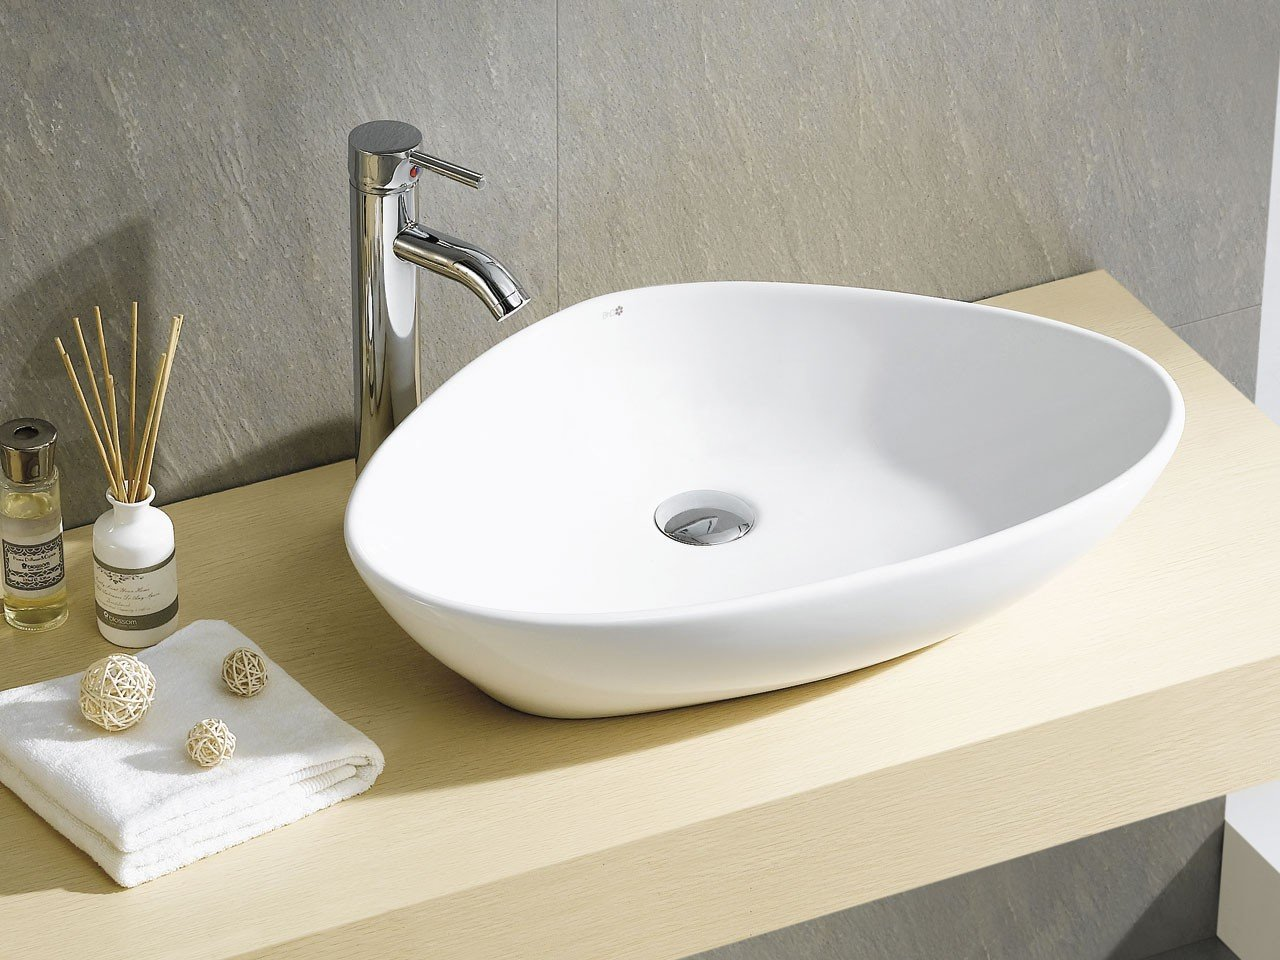 Lavabo d 39 arredo teruel 58 5x39 h14 ceram iperceramica - Lavabo in muratura per bagno ...